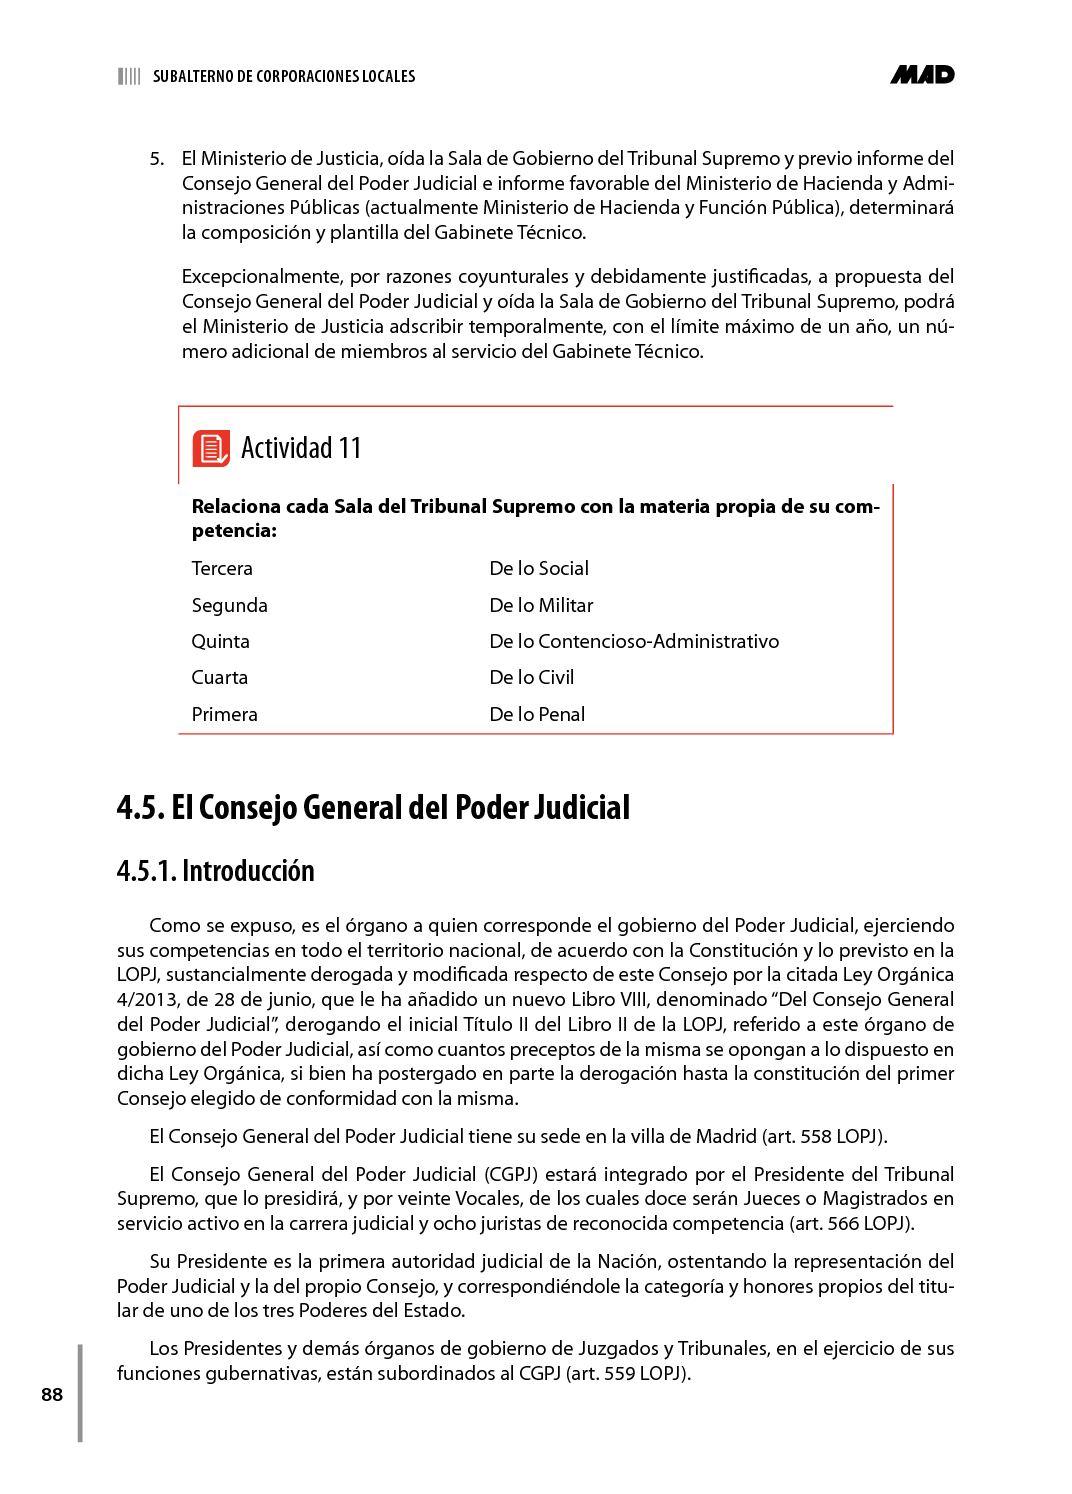 Volumen I - CALAMEO Downloader